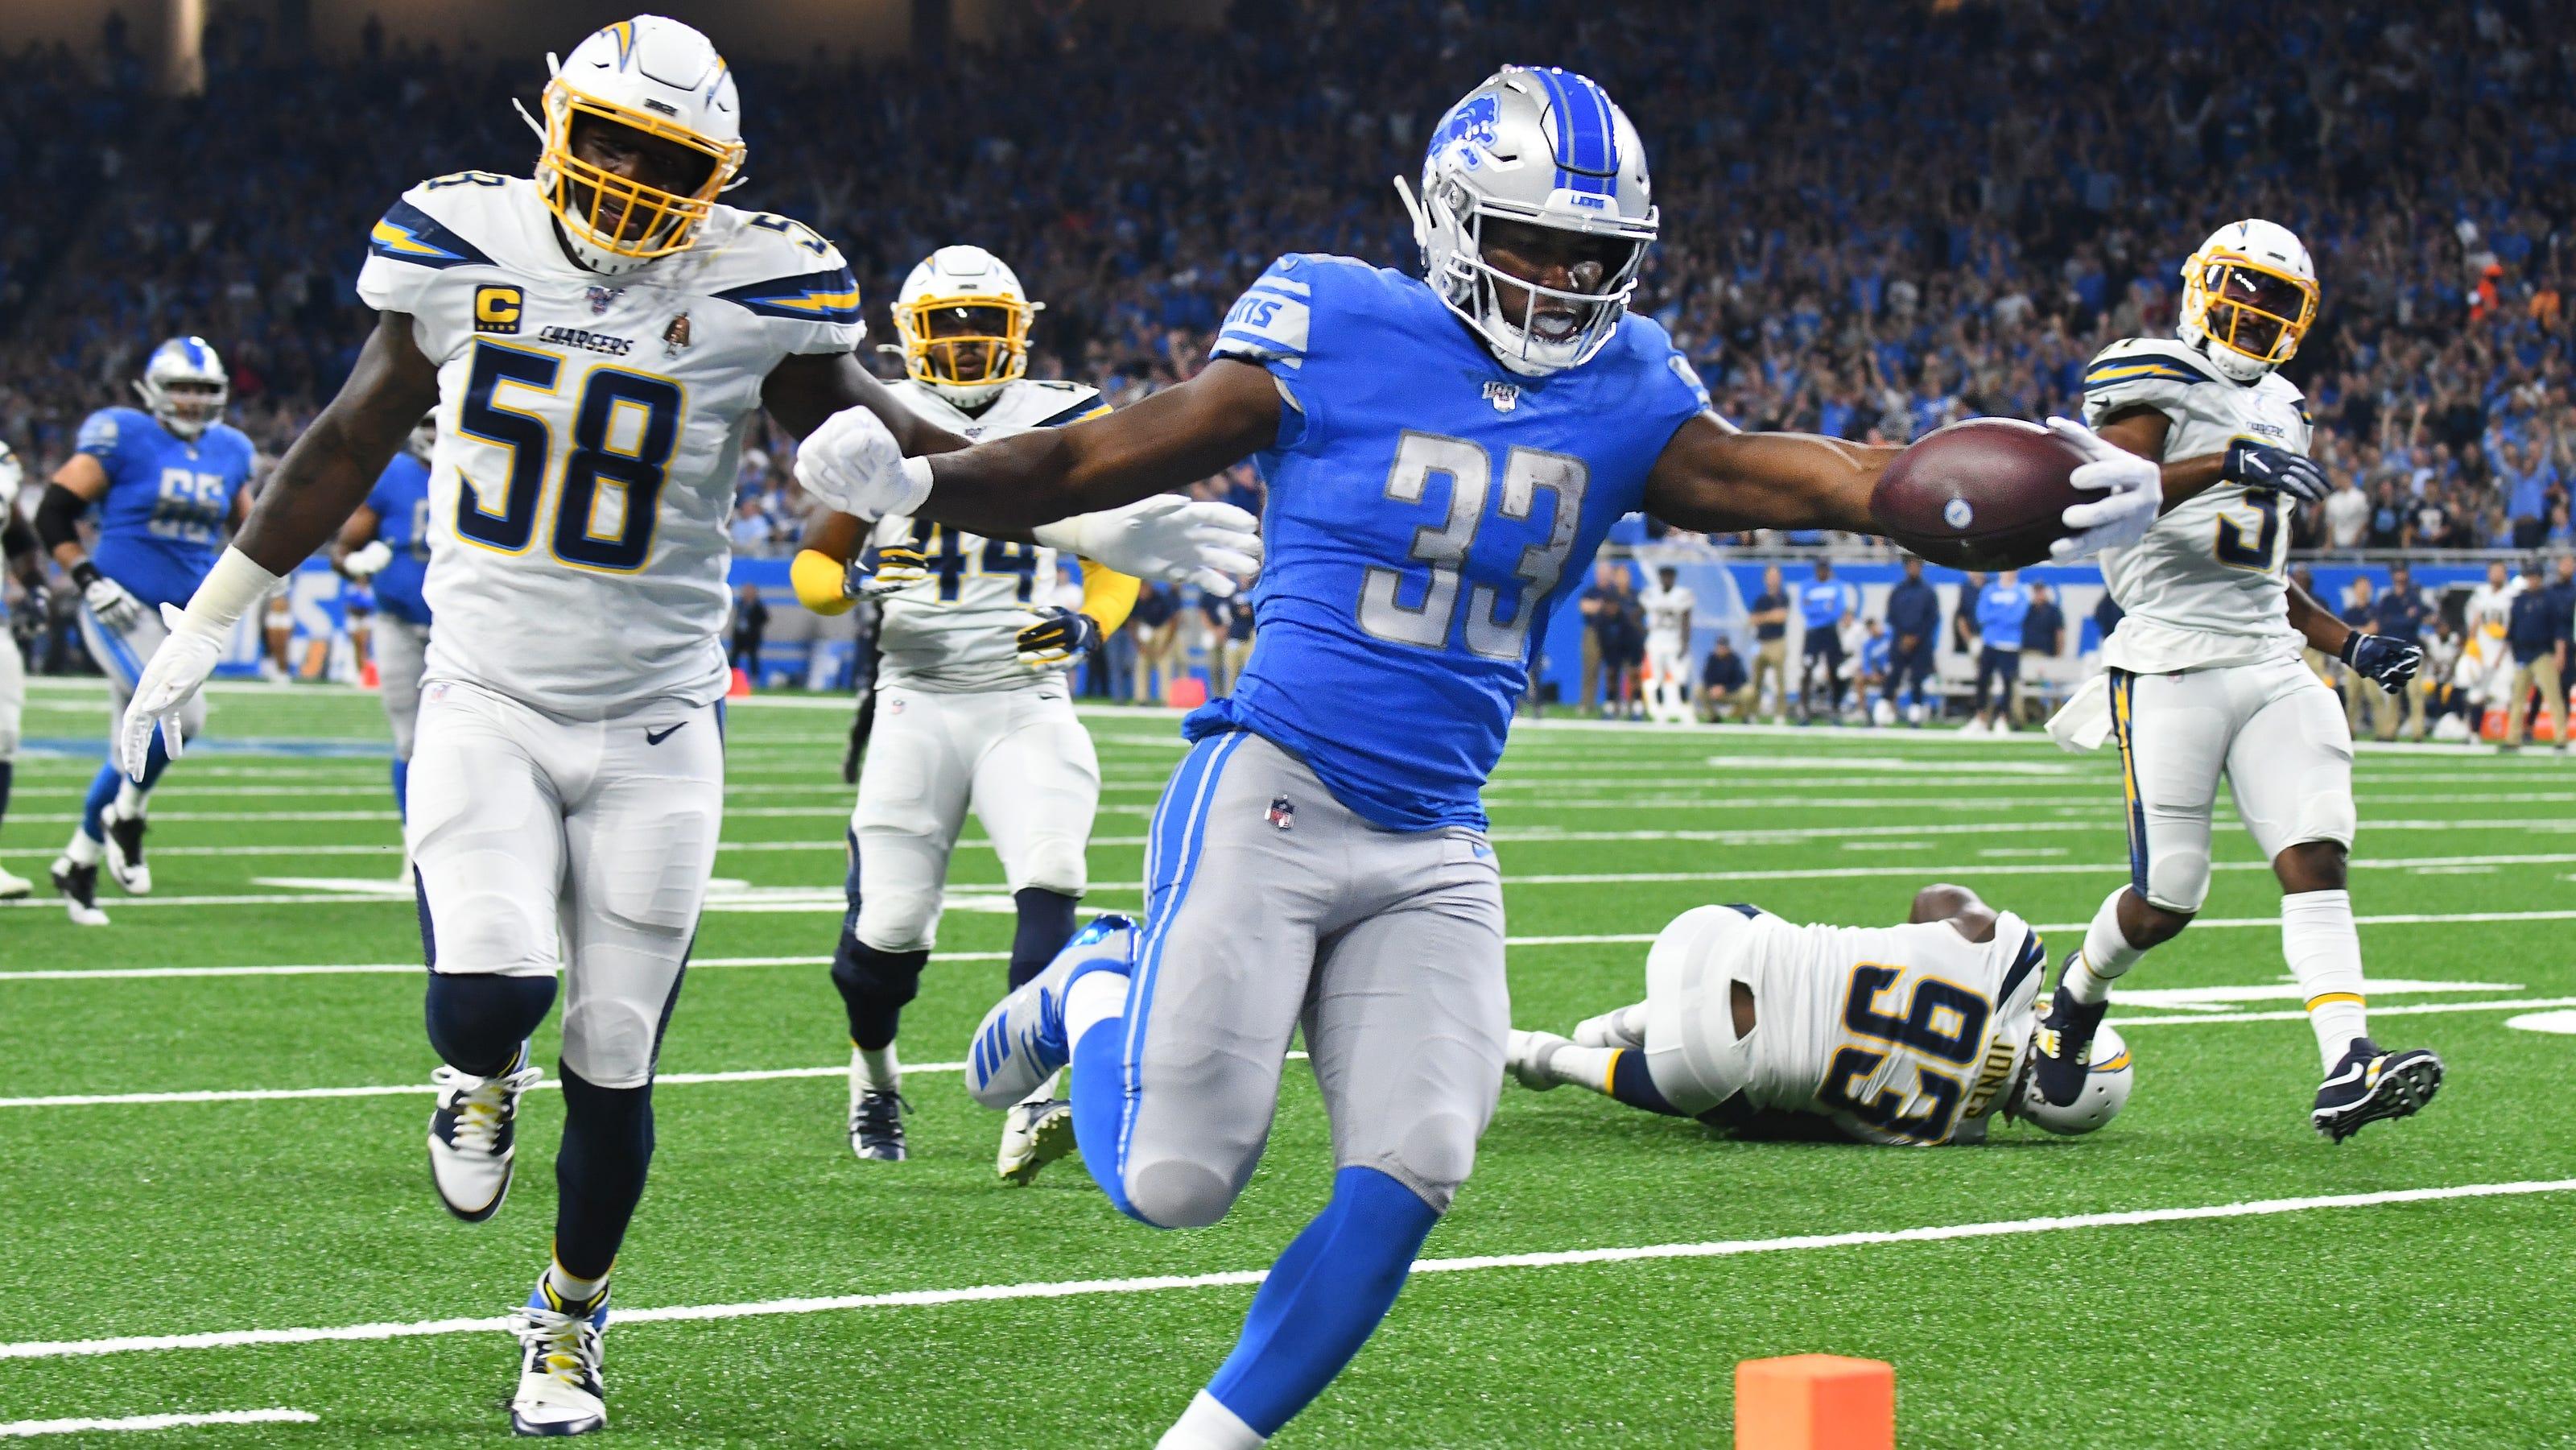 Lions Kerryon Johnson Packers Aaron Jones Get It Done Despite Cautious Workload